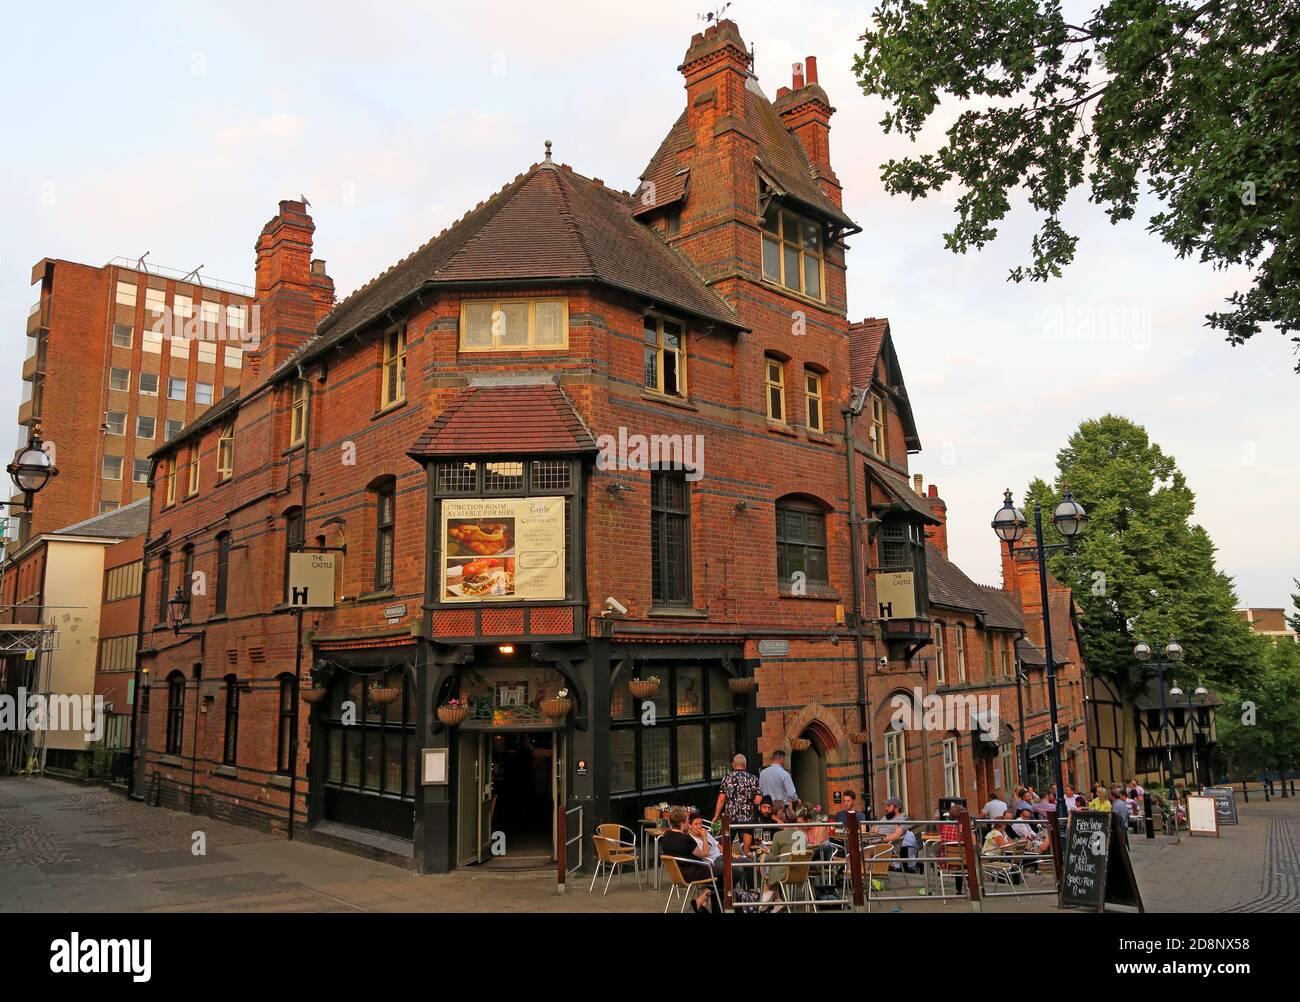 HotpixUK,@HotpixUK,GoTonySmith,UK,England,Great Britain,GB,Nottingham,city centre,Nottingham city centre,Notts,Nottinghamshire,Traditional pub,Great British,1980,pub,The old castle inn,bar,in a bar/pub,beers,brewhouse,brewery